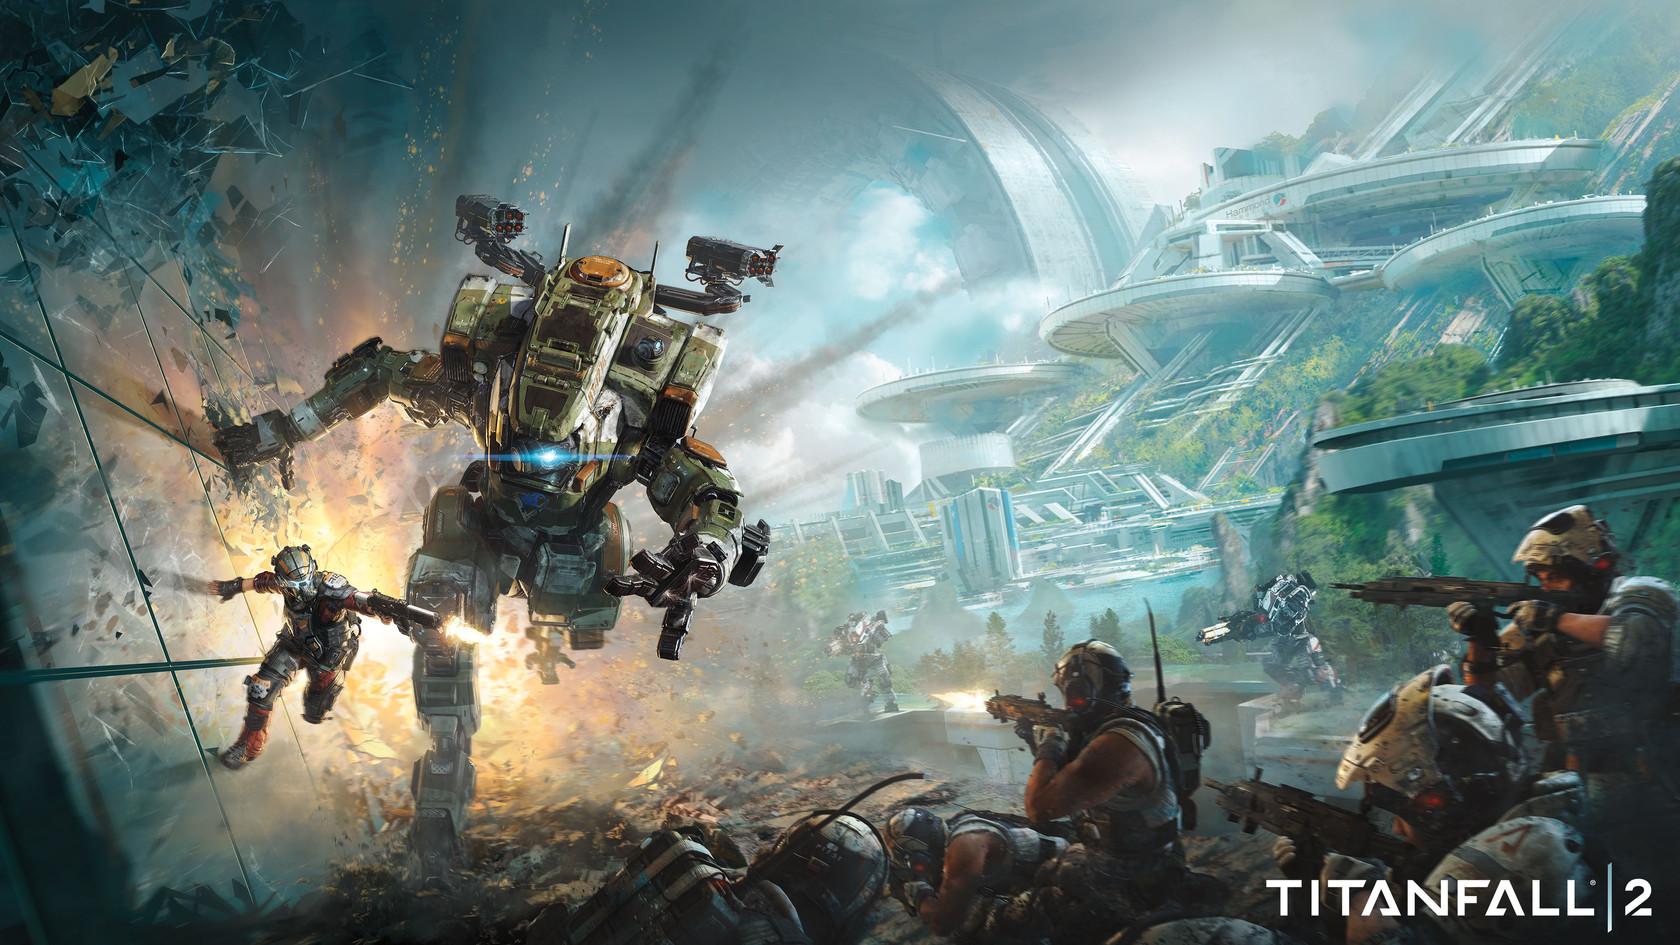 titanfall_2_battle_robots_soldiers_109679_1680x945